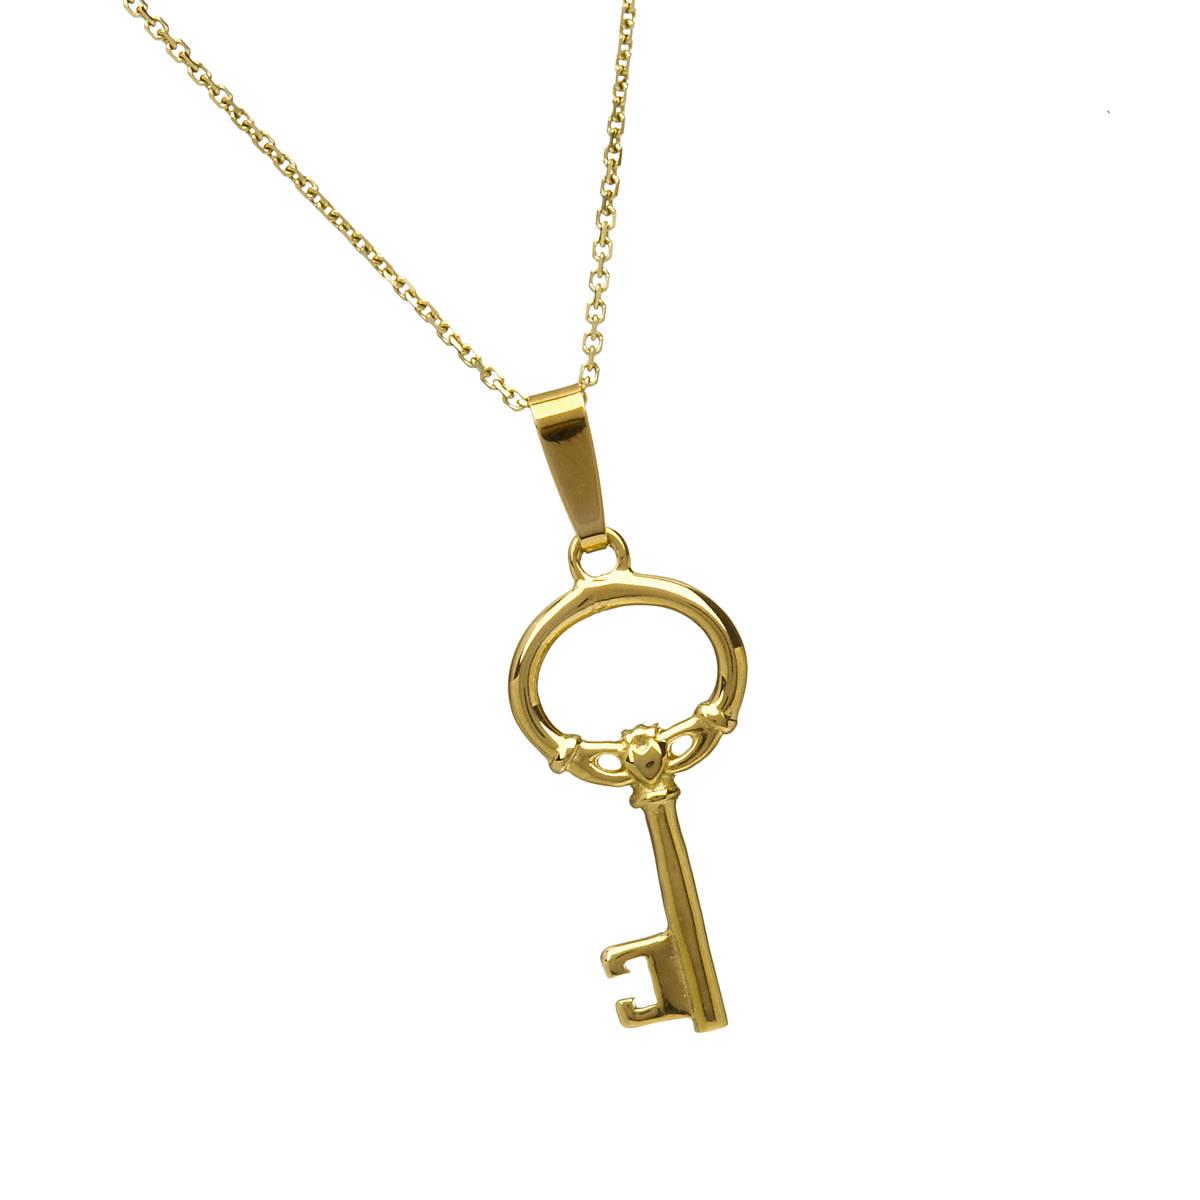 10 carat gold Claddagh key pendant.